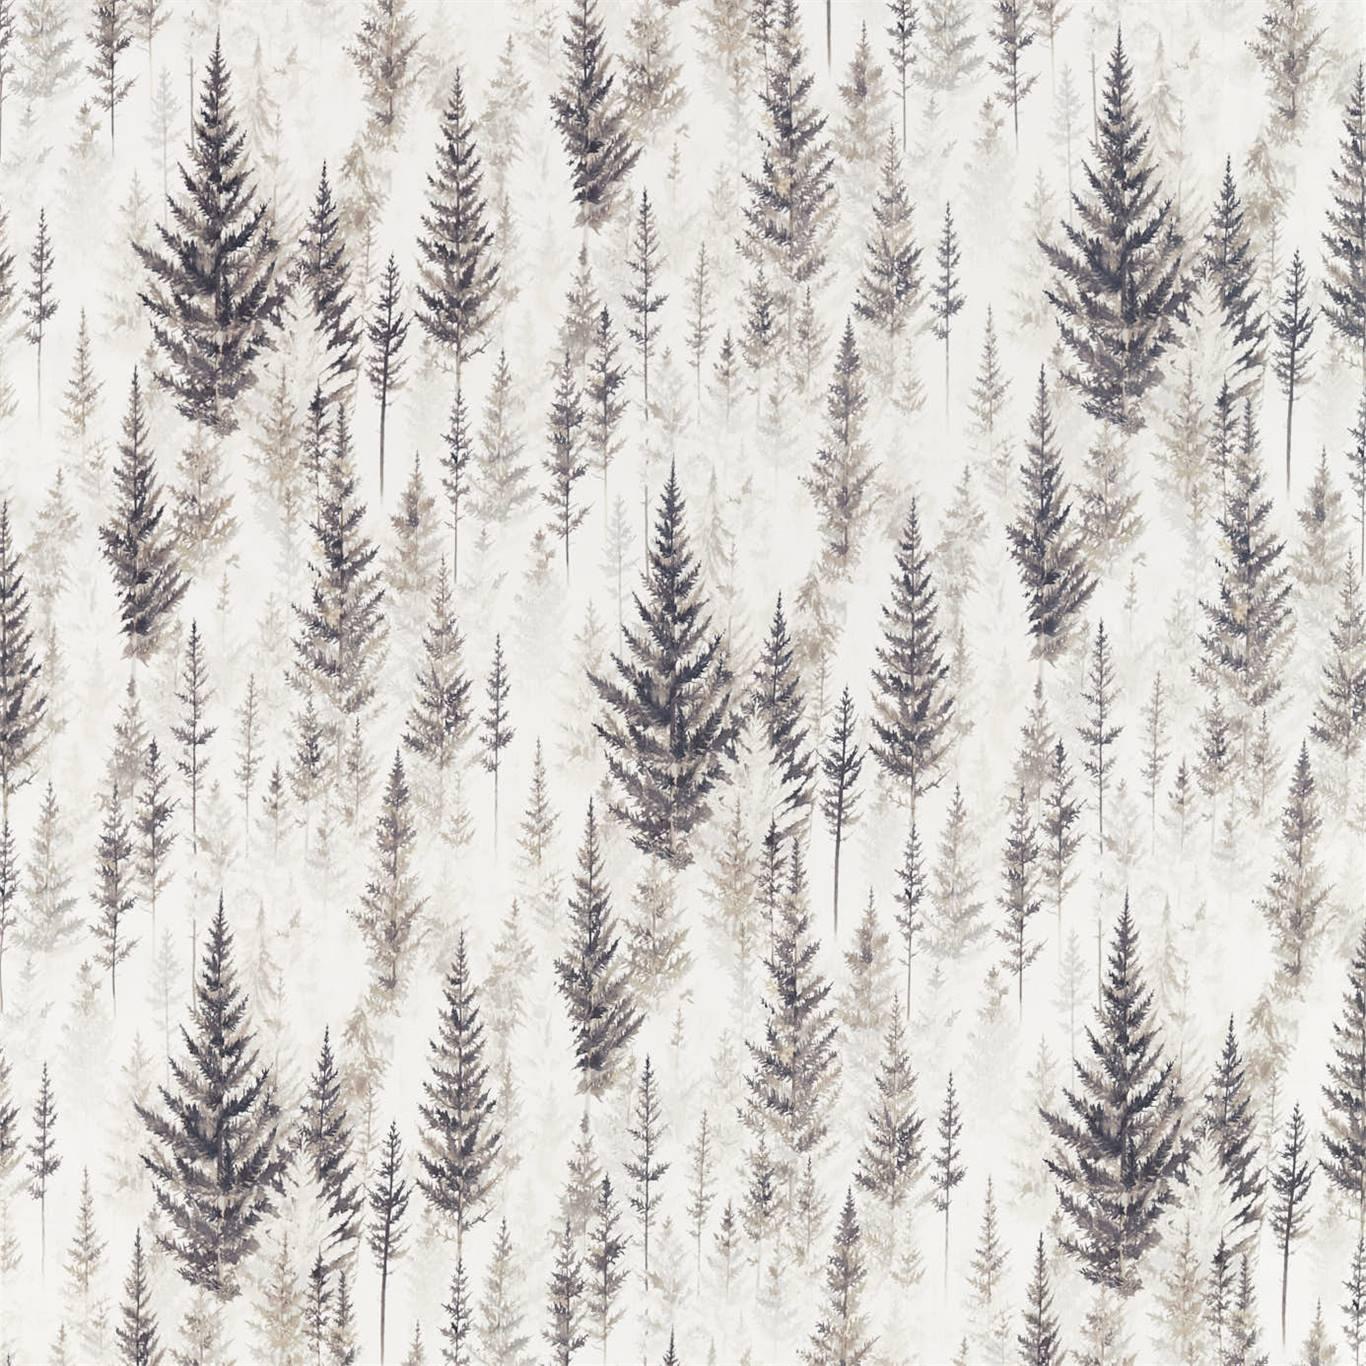 Image of Sanderson Juniper Pine Elder Bark Curtain Fabric 226535